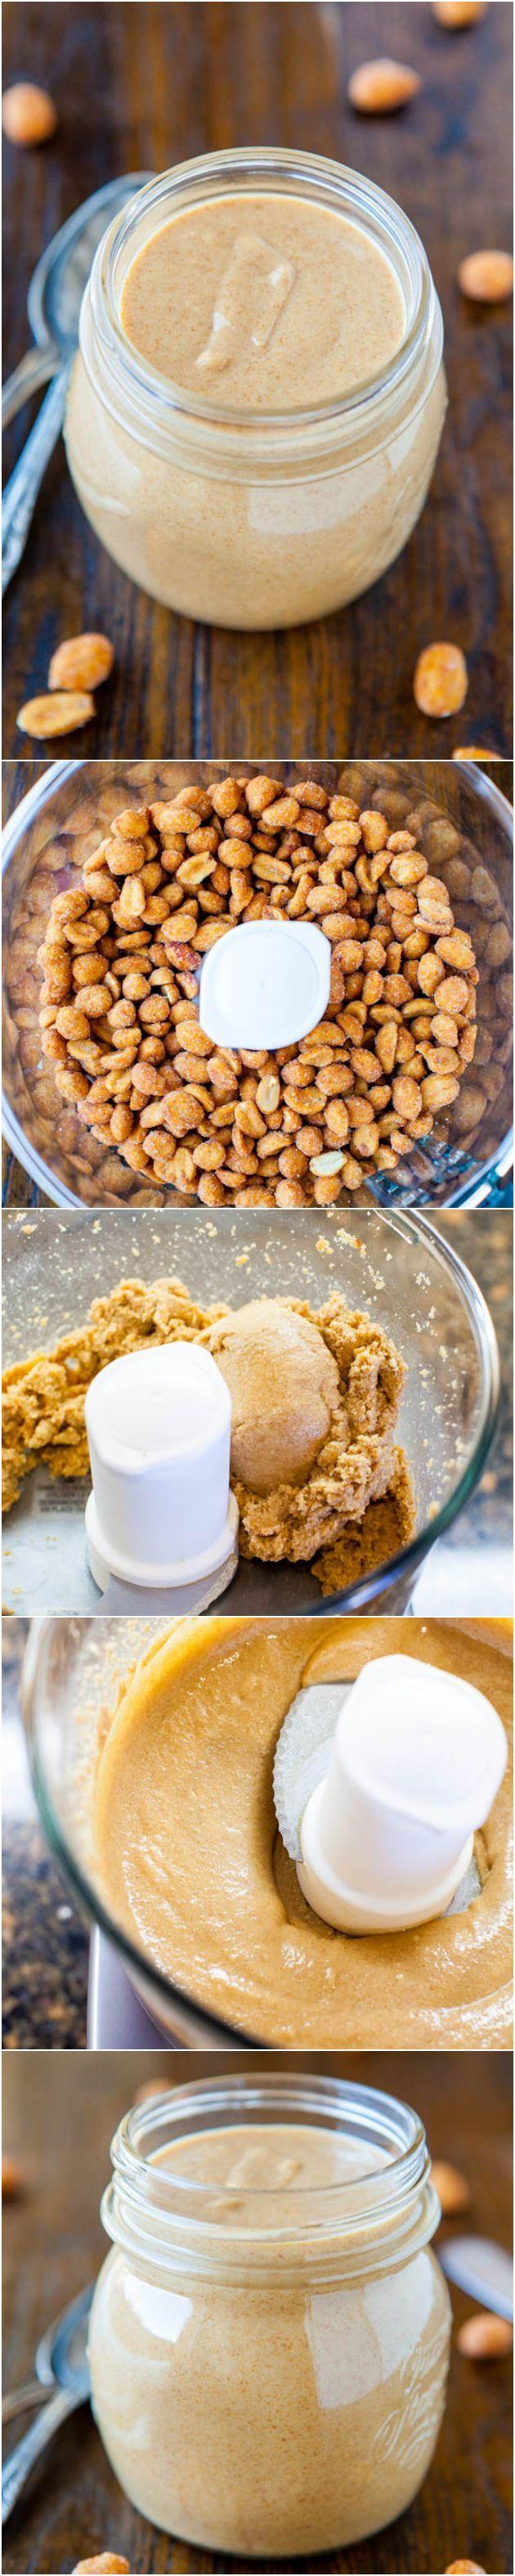 Арахісова паста( Арахісове масло)